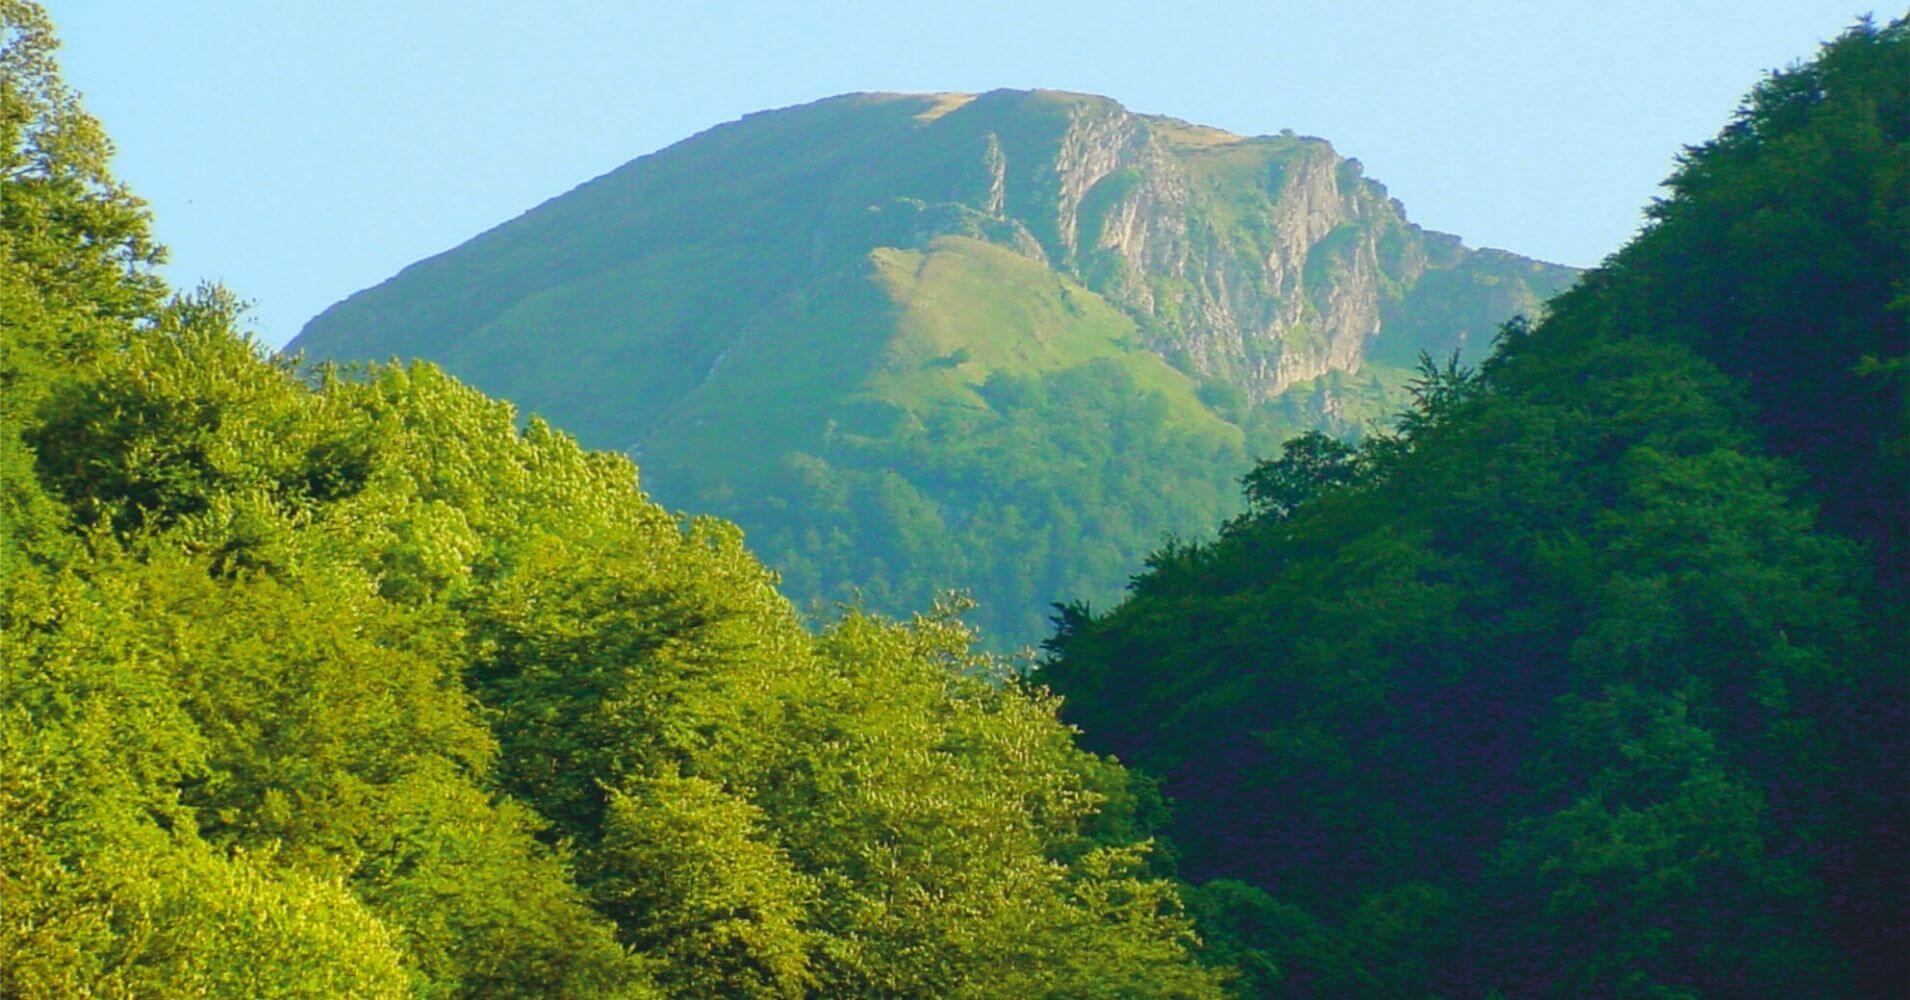 Montañas de Larrau. Pirineos Atlánticos, Nueva Aquitania. Francia.